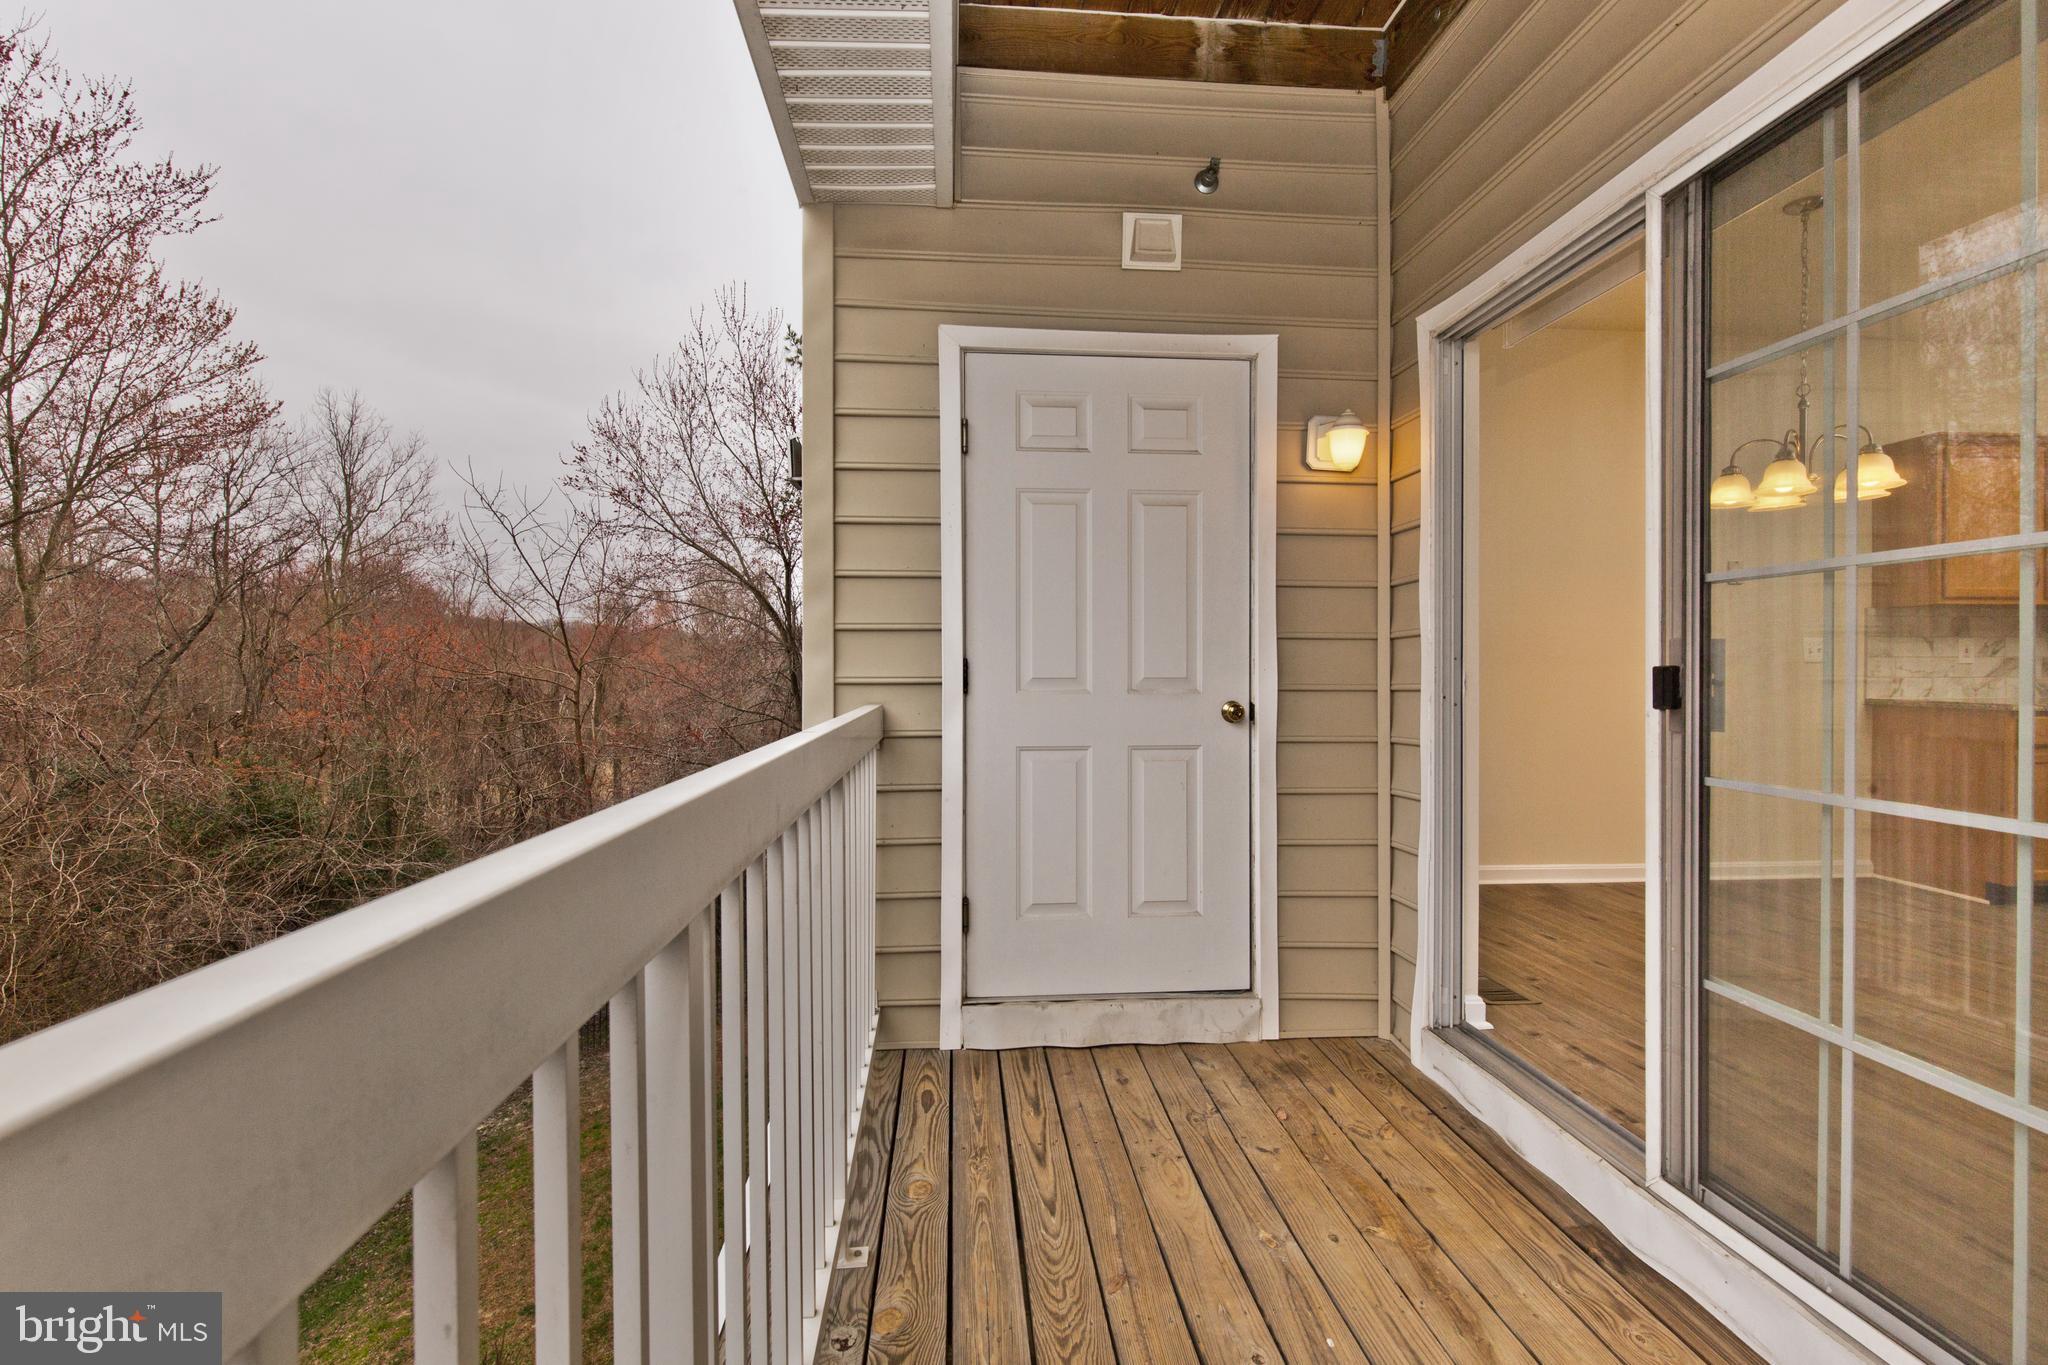 14324 HAMPSHIRE HALL COURT, UPPER MARLBORO, Maryland 20772, 2 Bedrooms Bedrooms, ,2 BathroomsBathrooms,Condominium,For Sale,14324 HAMPSHIRE HALL COURT,MDPG601232